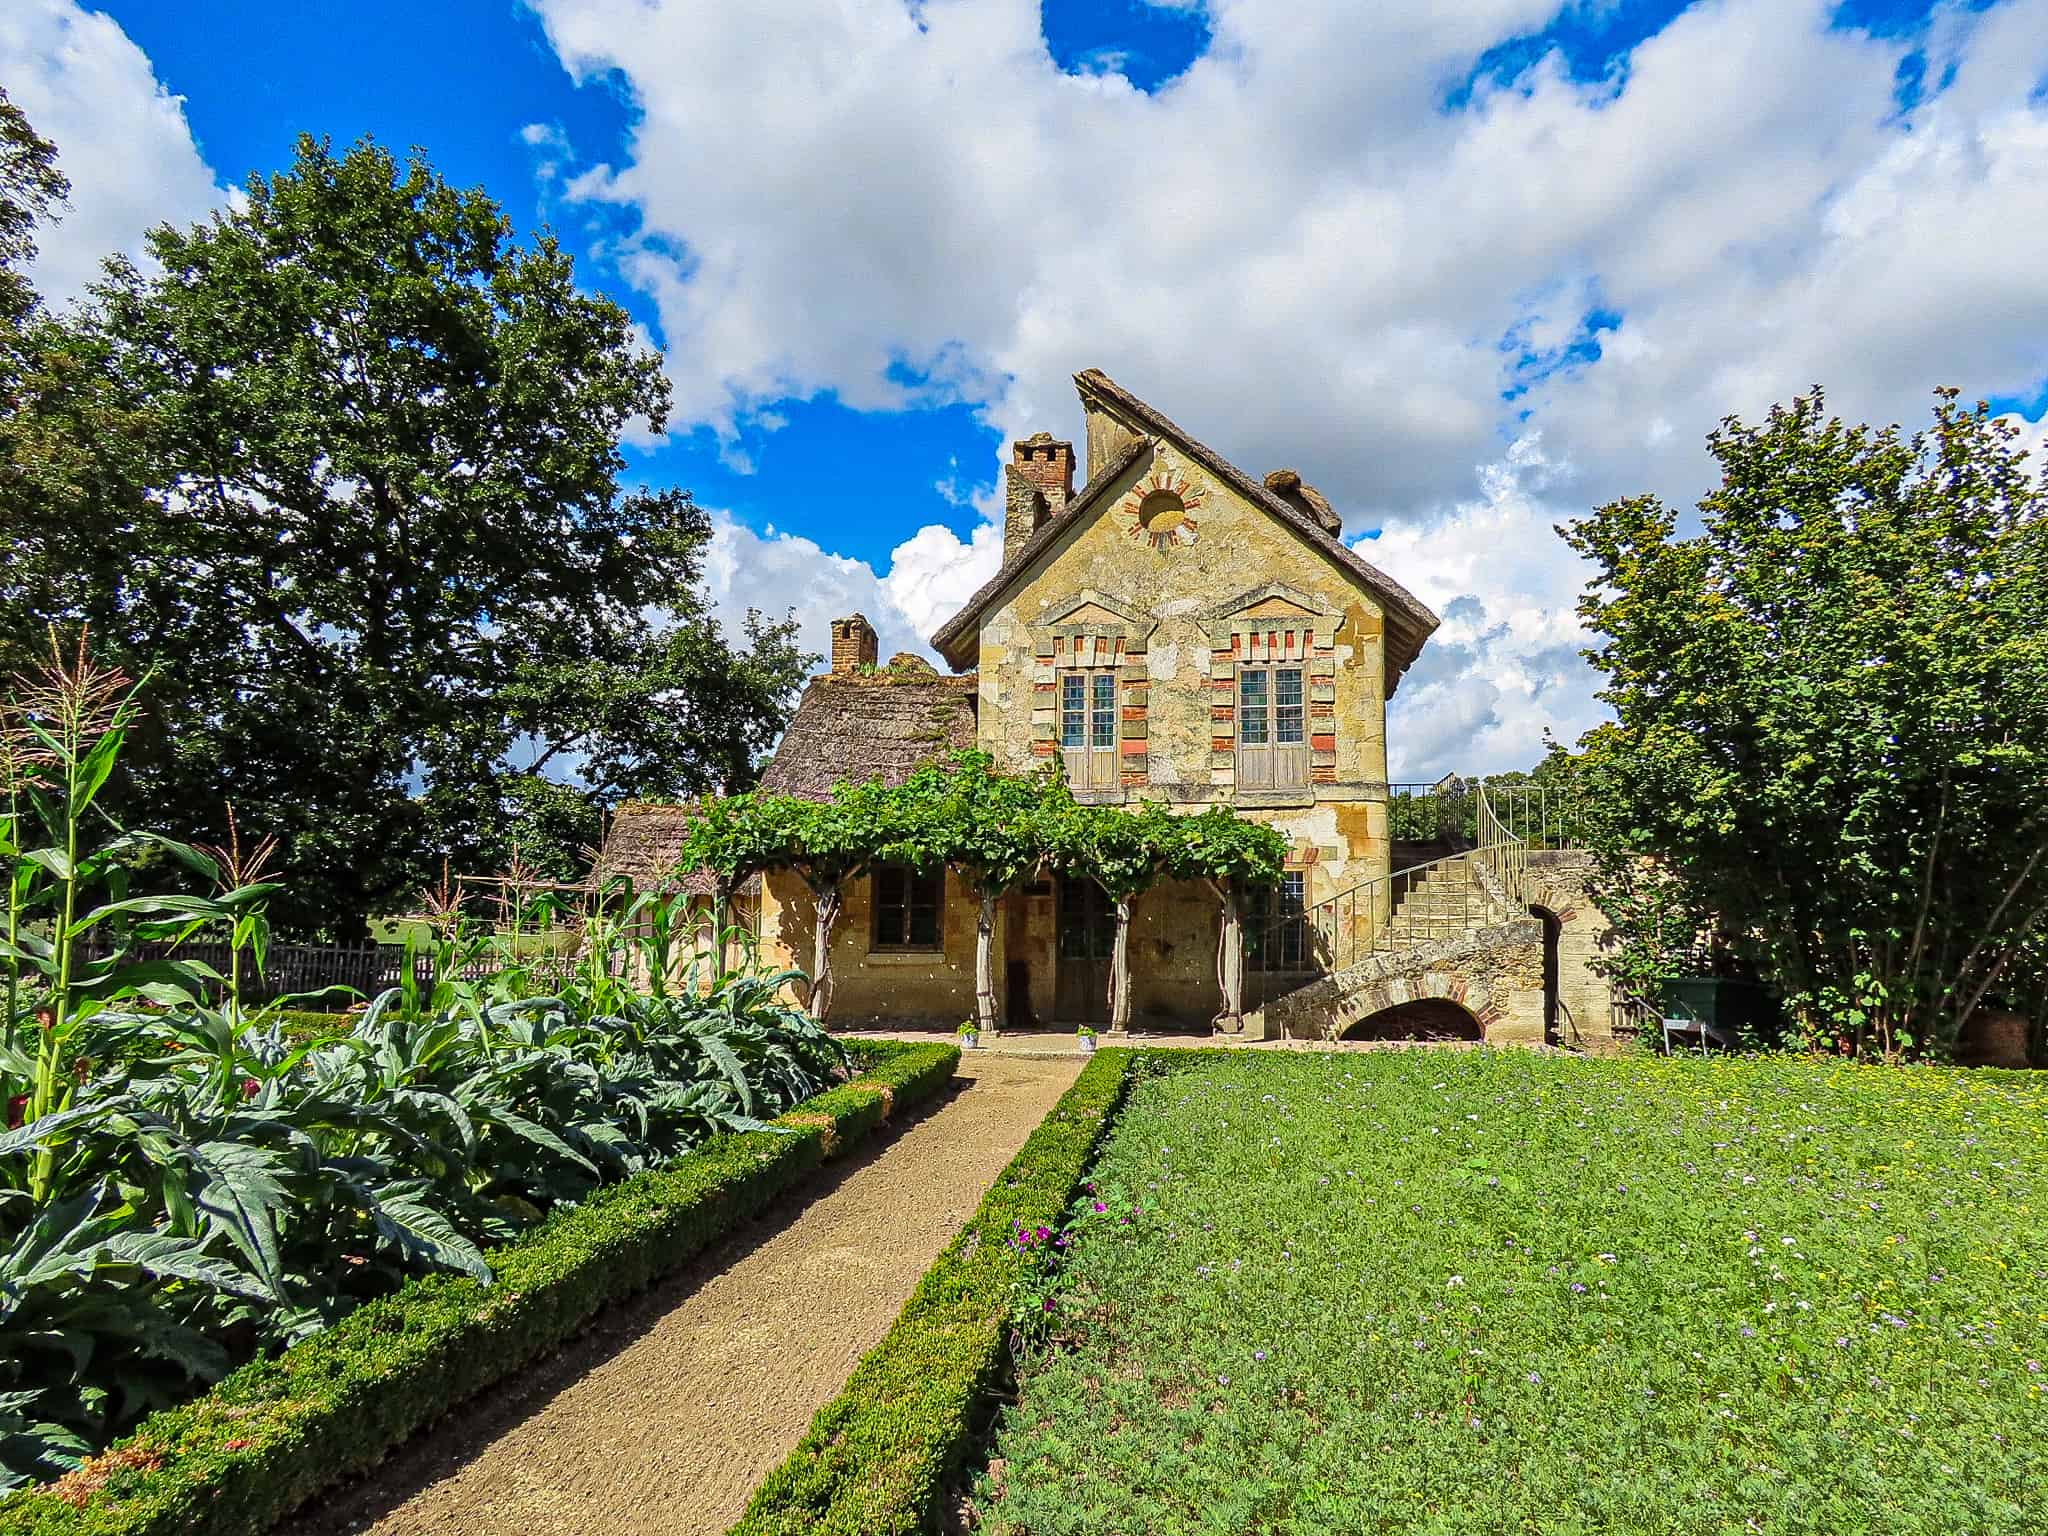 hameau-de-la-reine-versailles-jardins